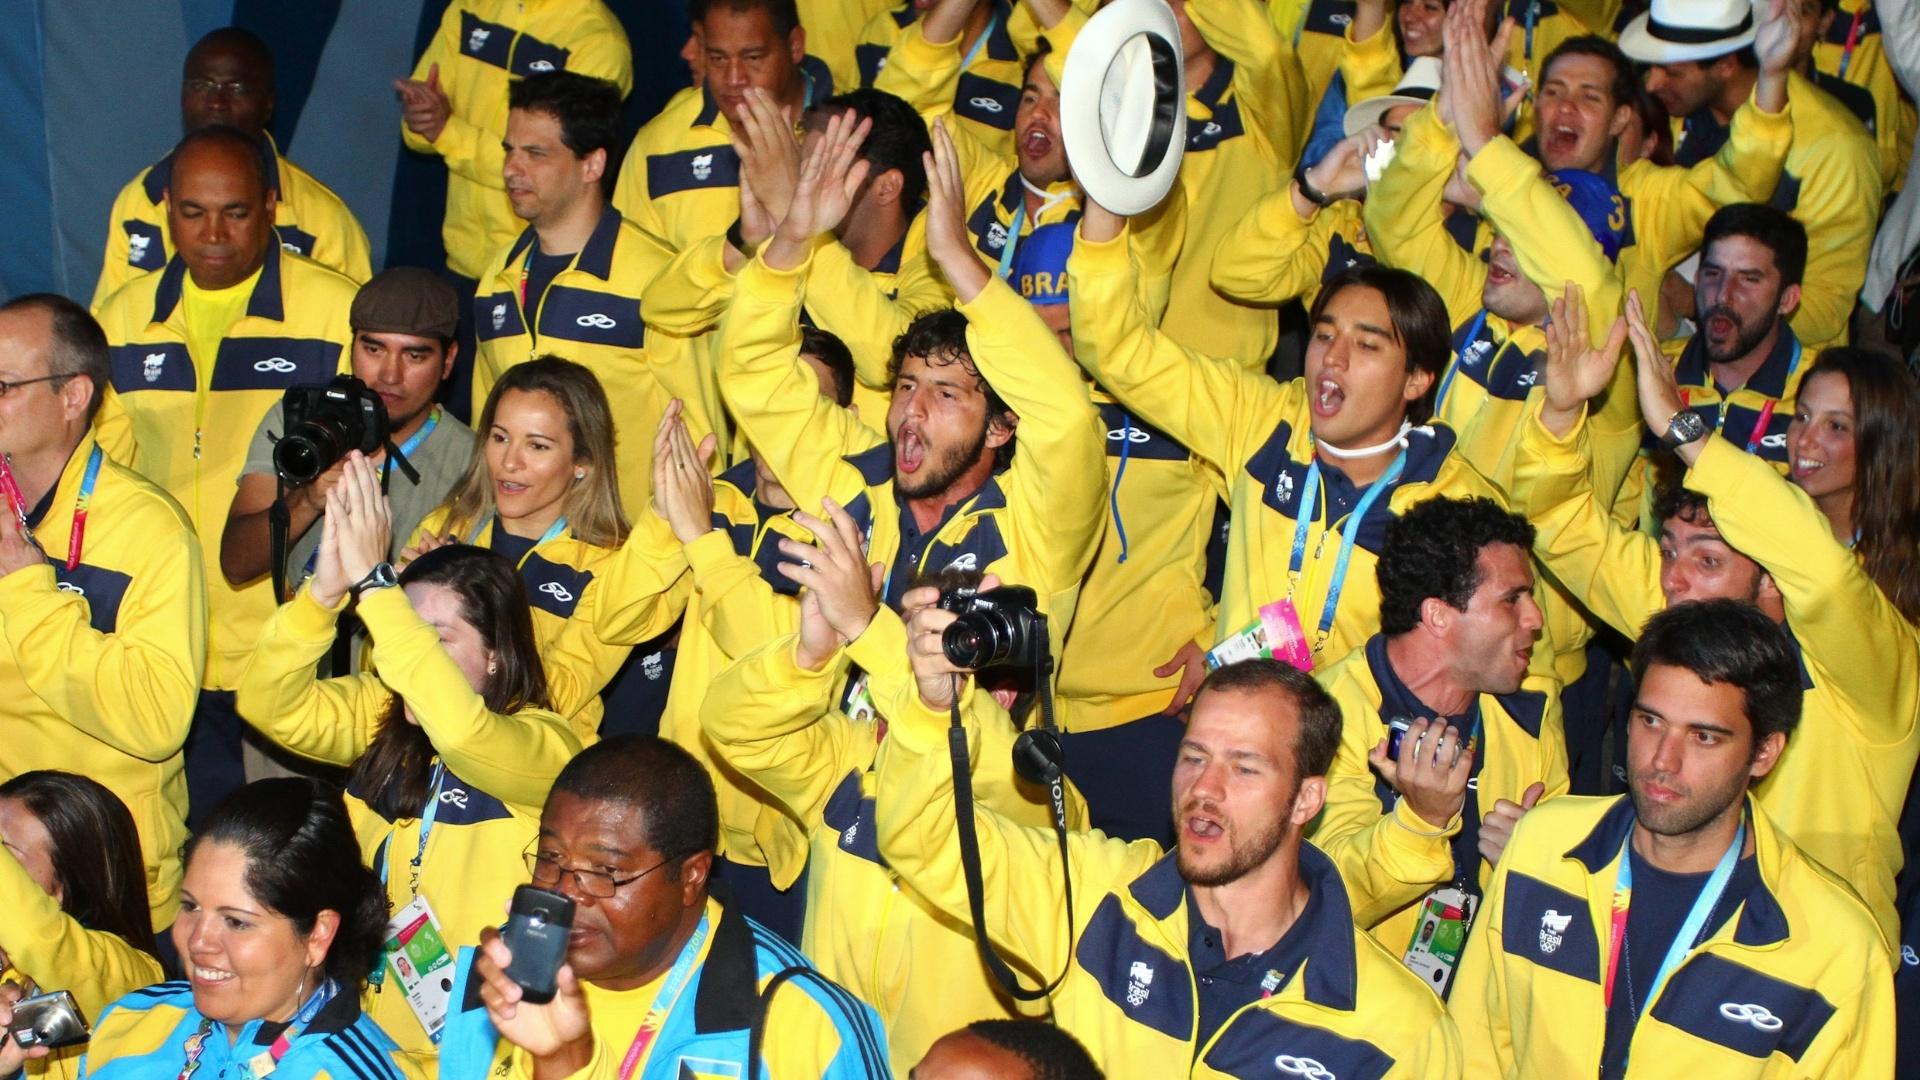 Atletas brasileiros fazem festa durante encerramento do Pan-Americano 2011 (31/10/2011)